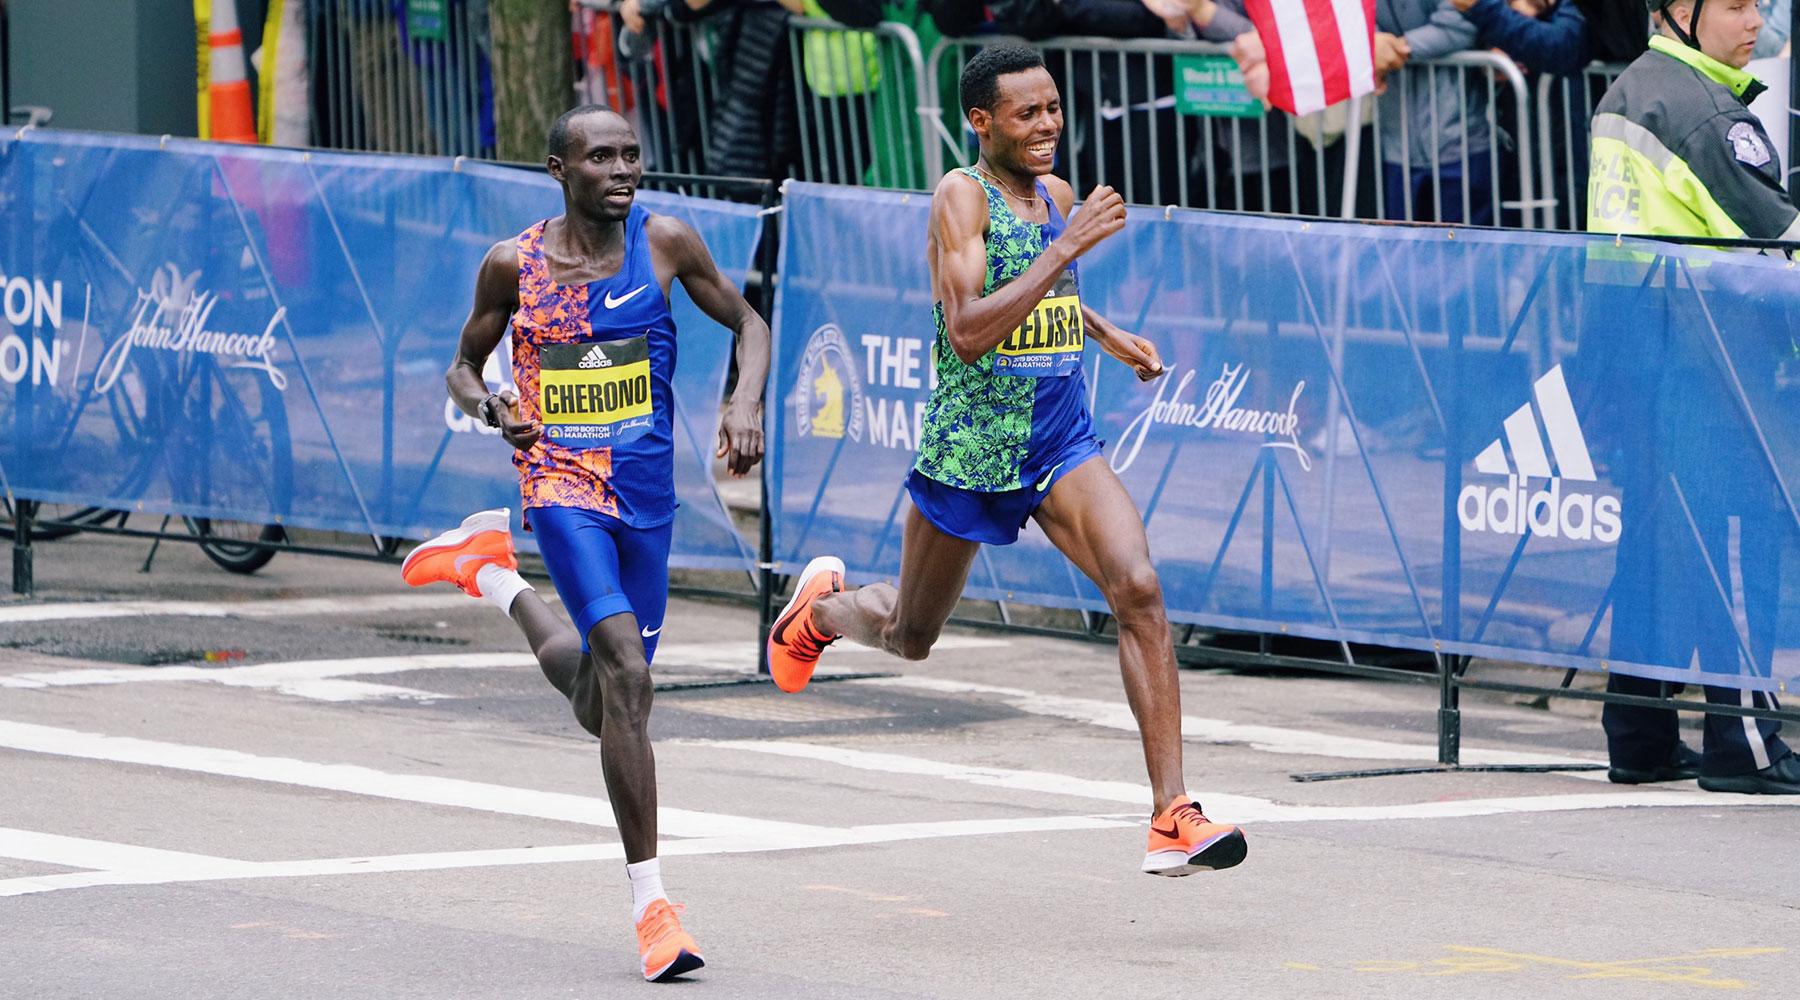 Sprint finish stars back for more in Boston